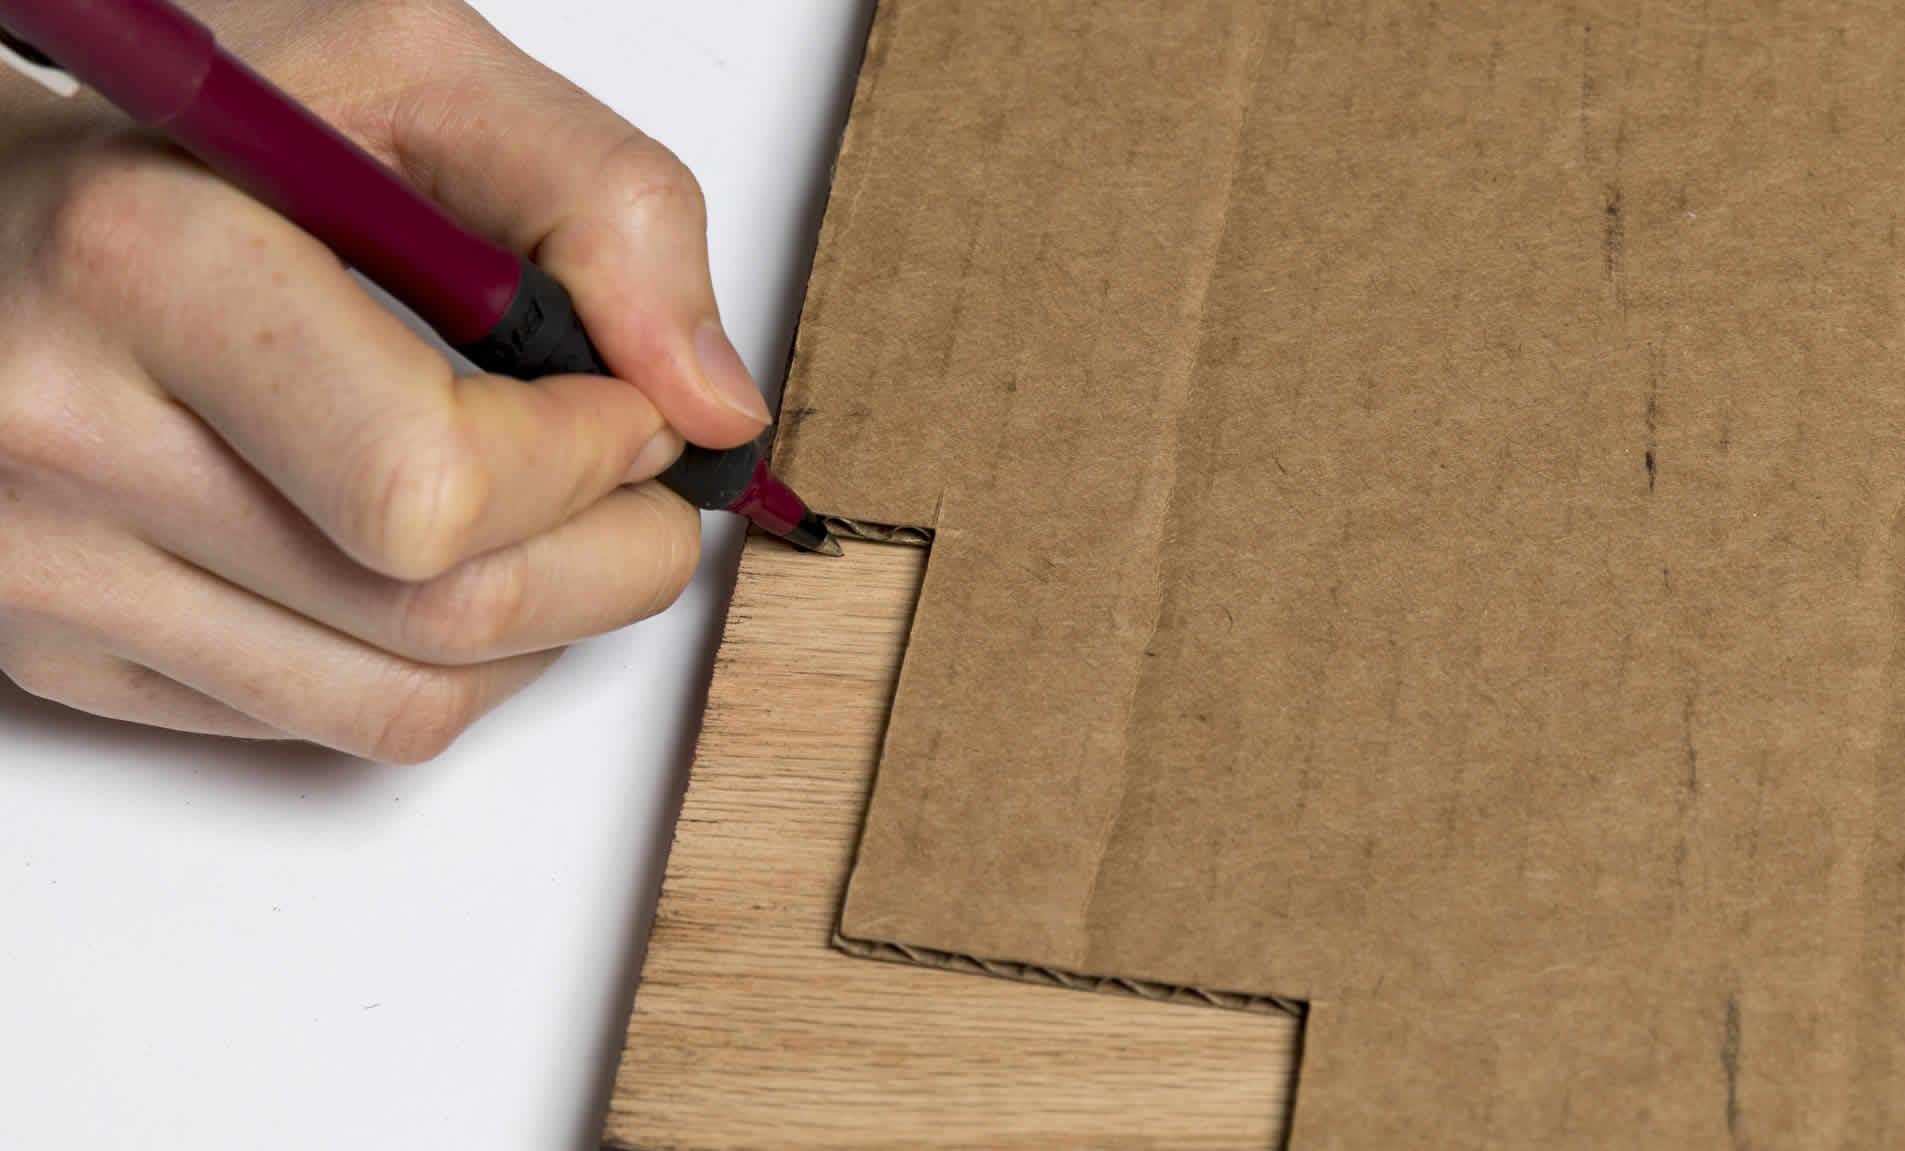 Pen marking wood to be cut